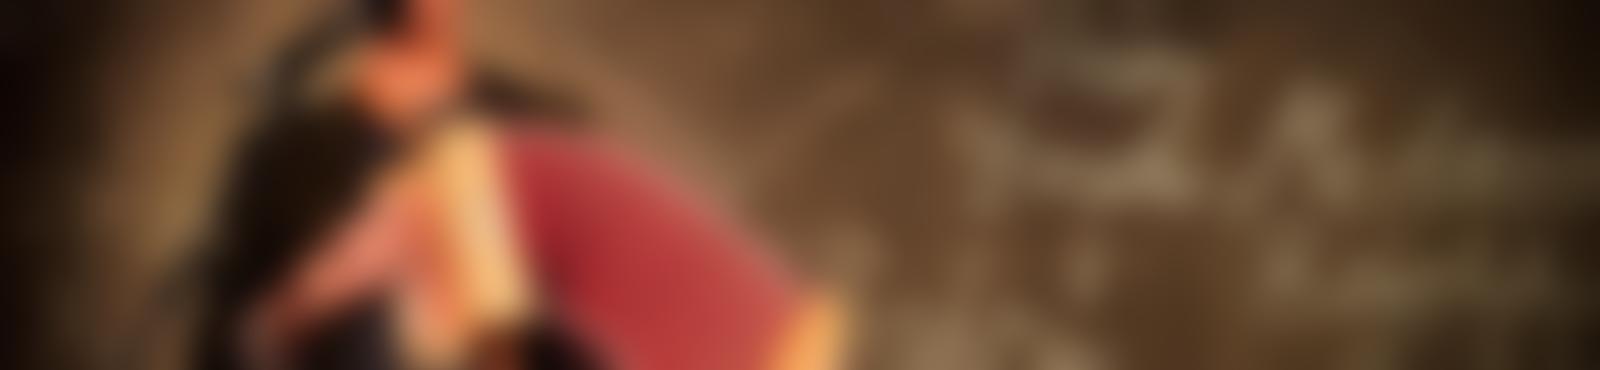 Blurred 74cc3bf0 4248 46de ab23 4eaf97c7c82f